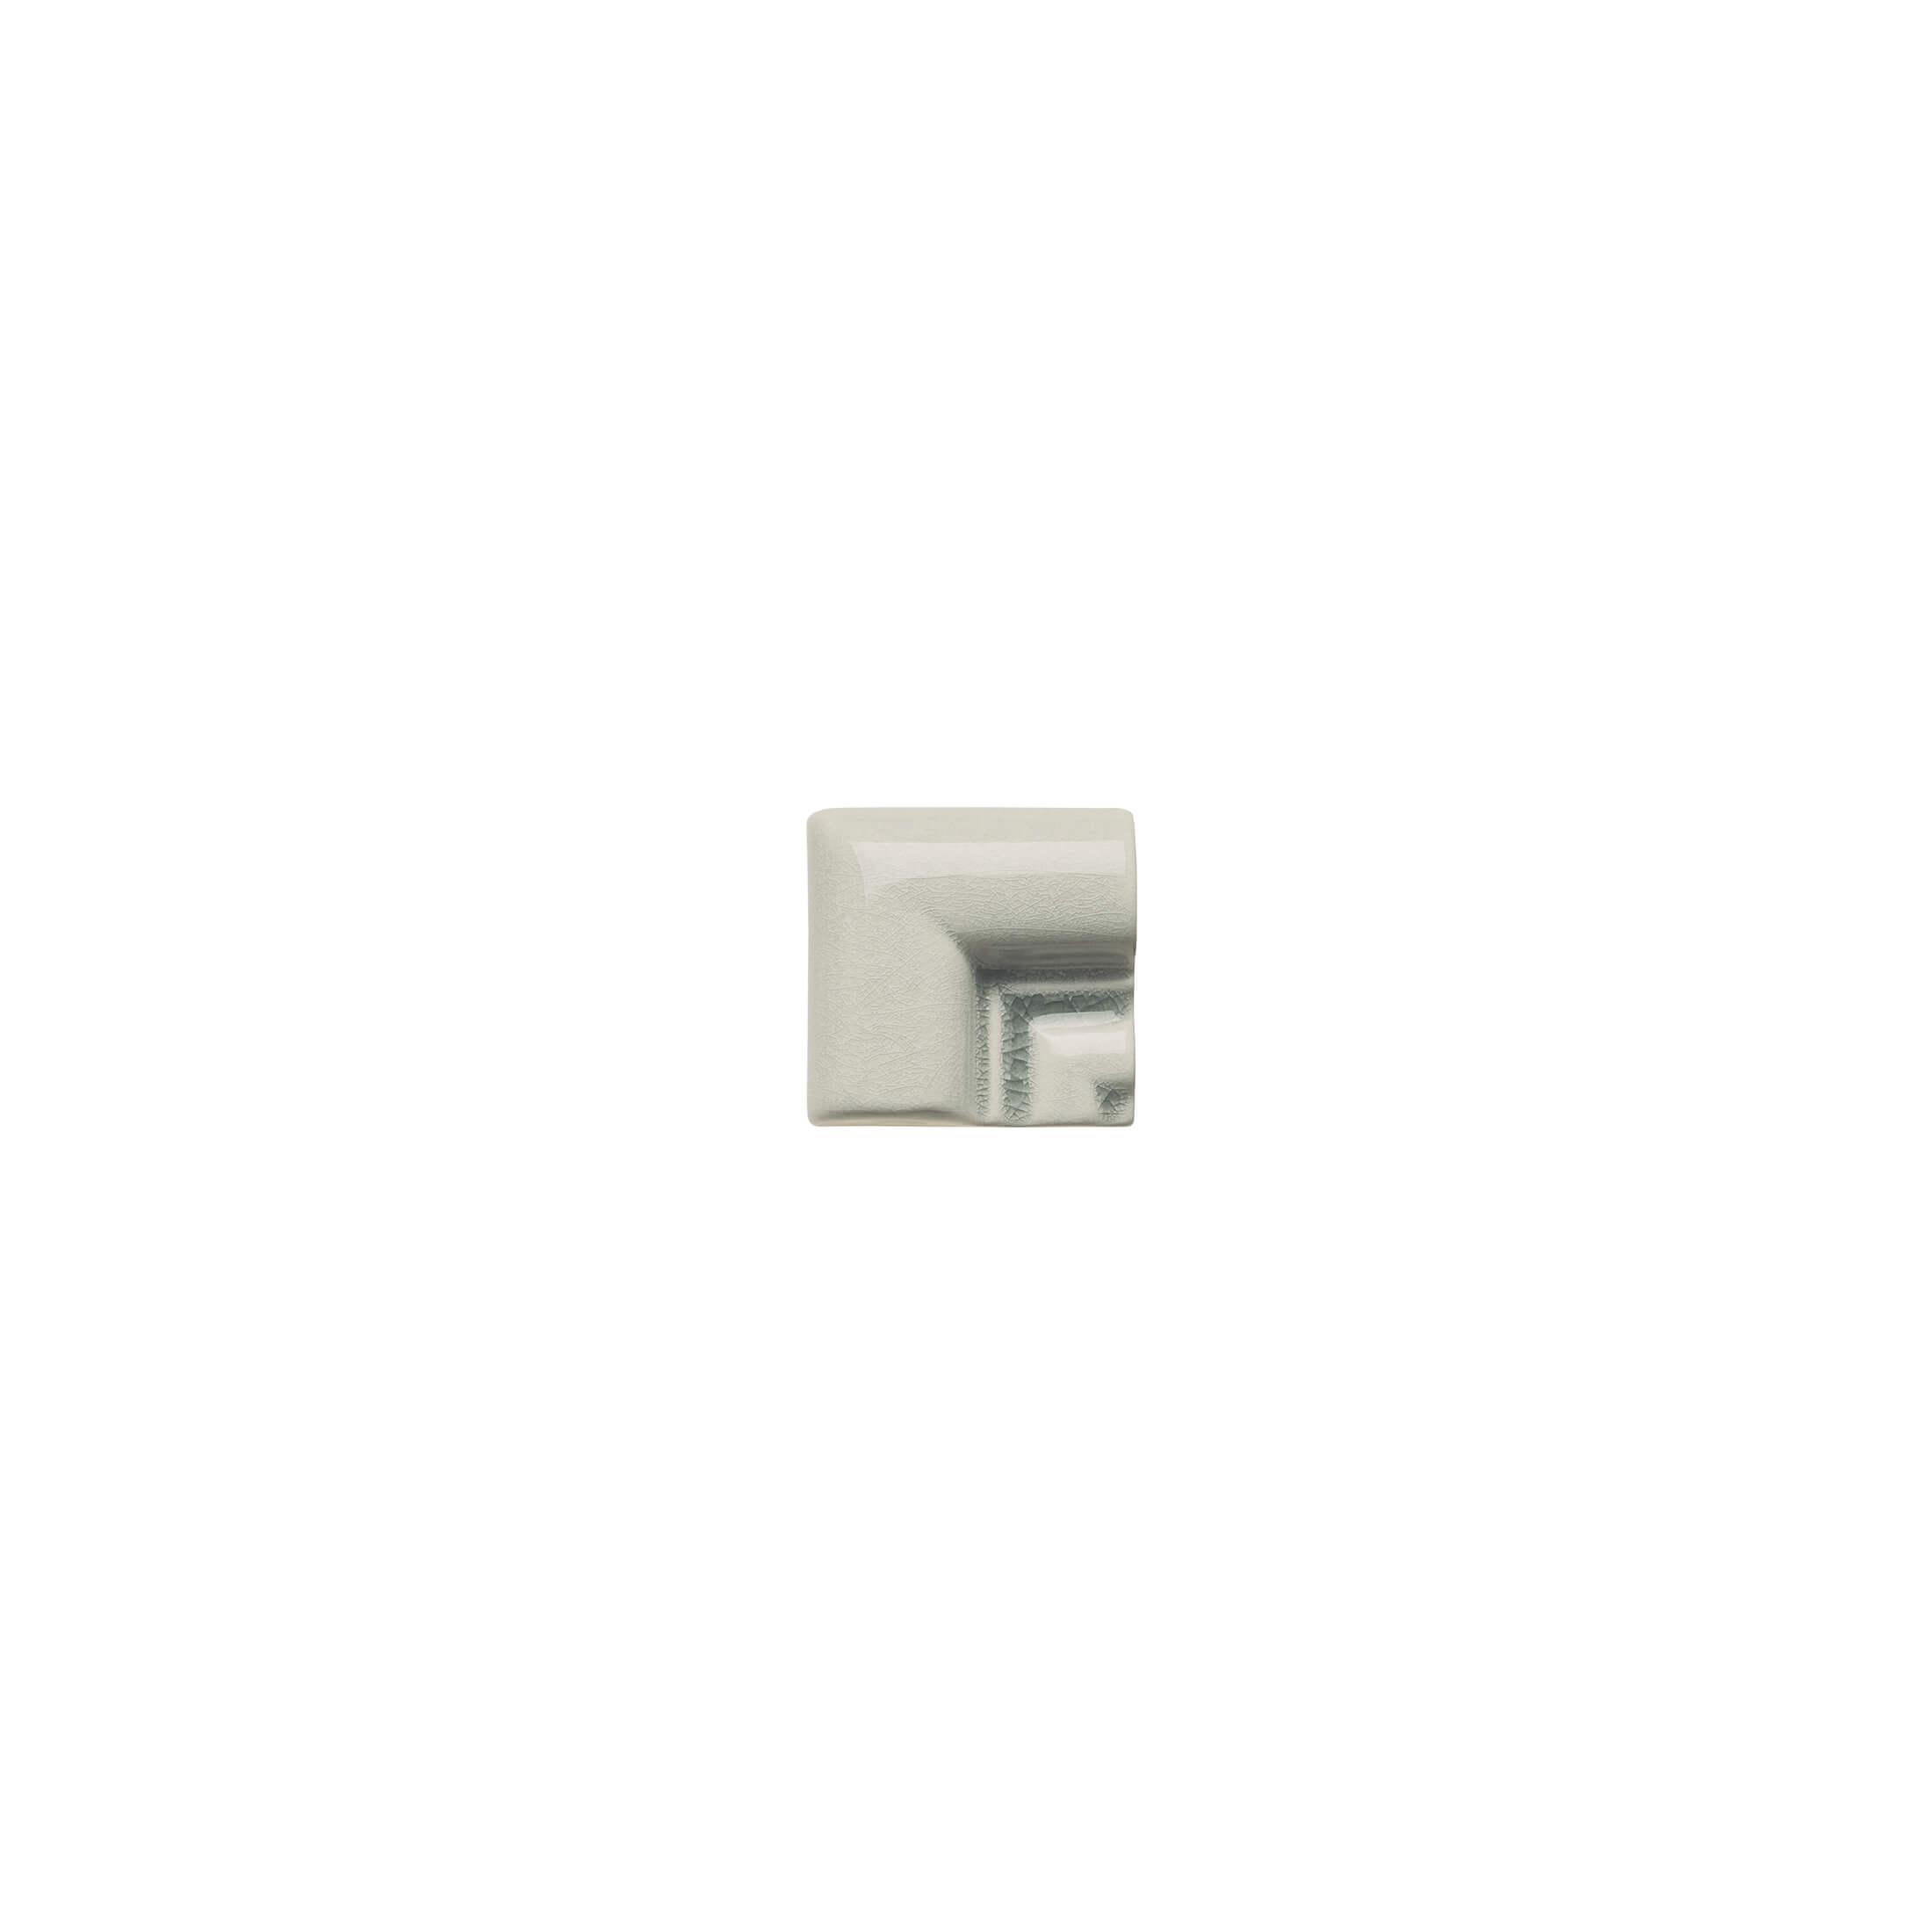 ADOC5082 - ANGULO MARCOMOLDURA - 5 cm X 15 cm